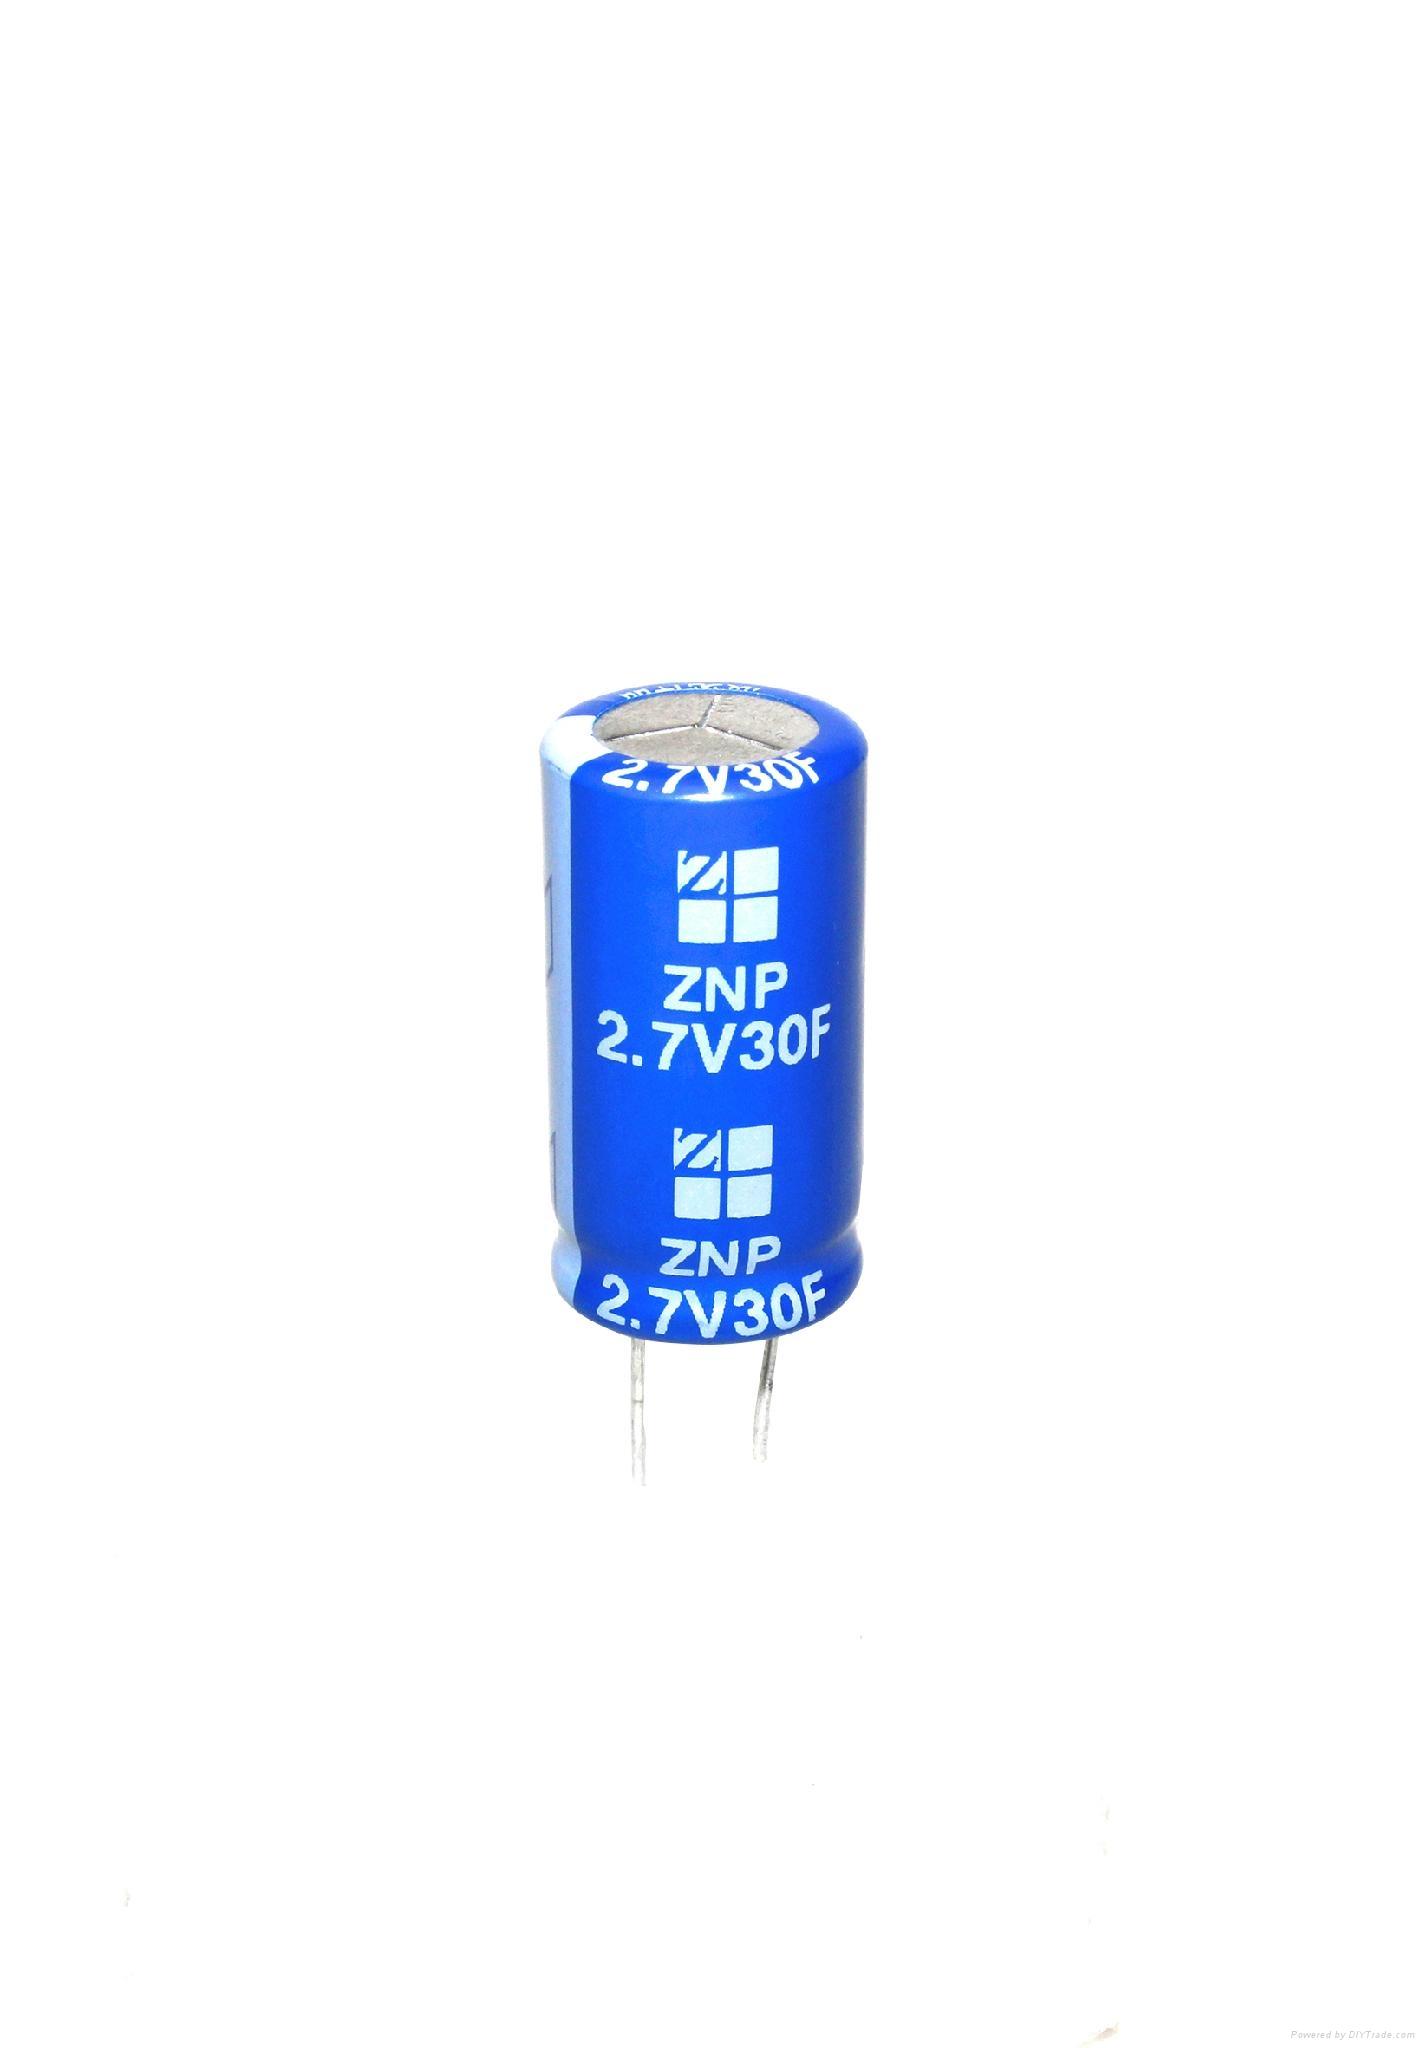 Ultra capacitor supercapacitor 2.7V 30F 3